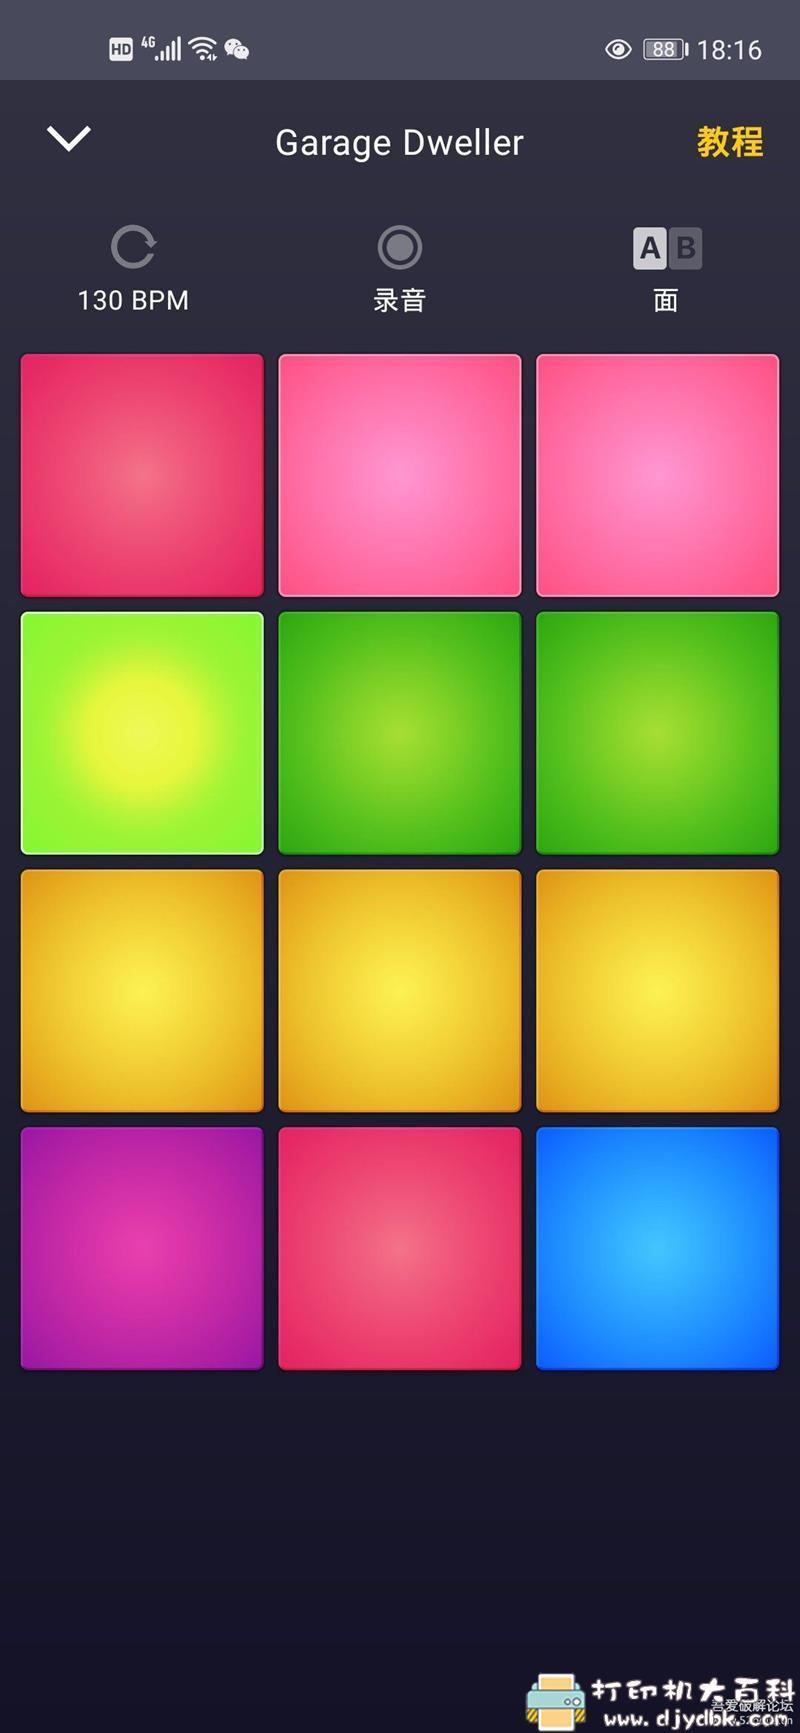 [Android]DPM–一款制作音乐的小软件,也可以当游戏玩 配图 No.2